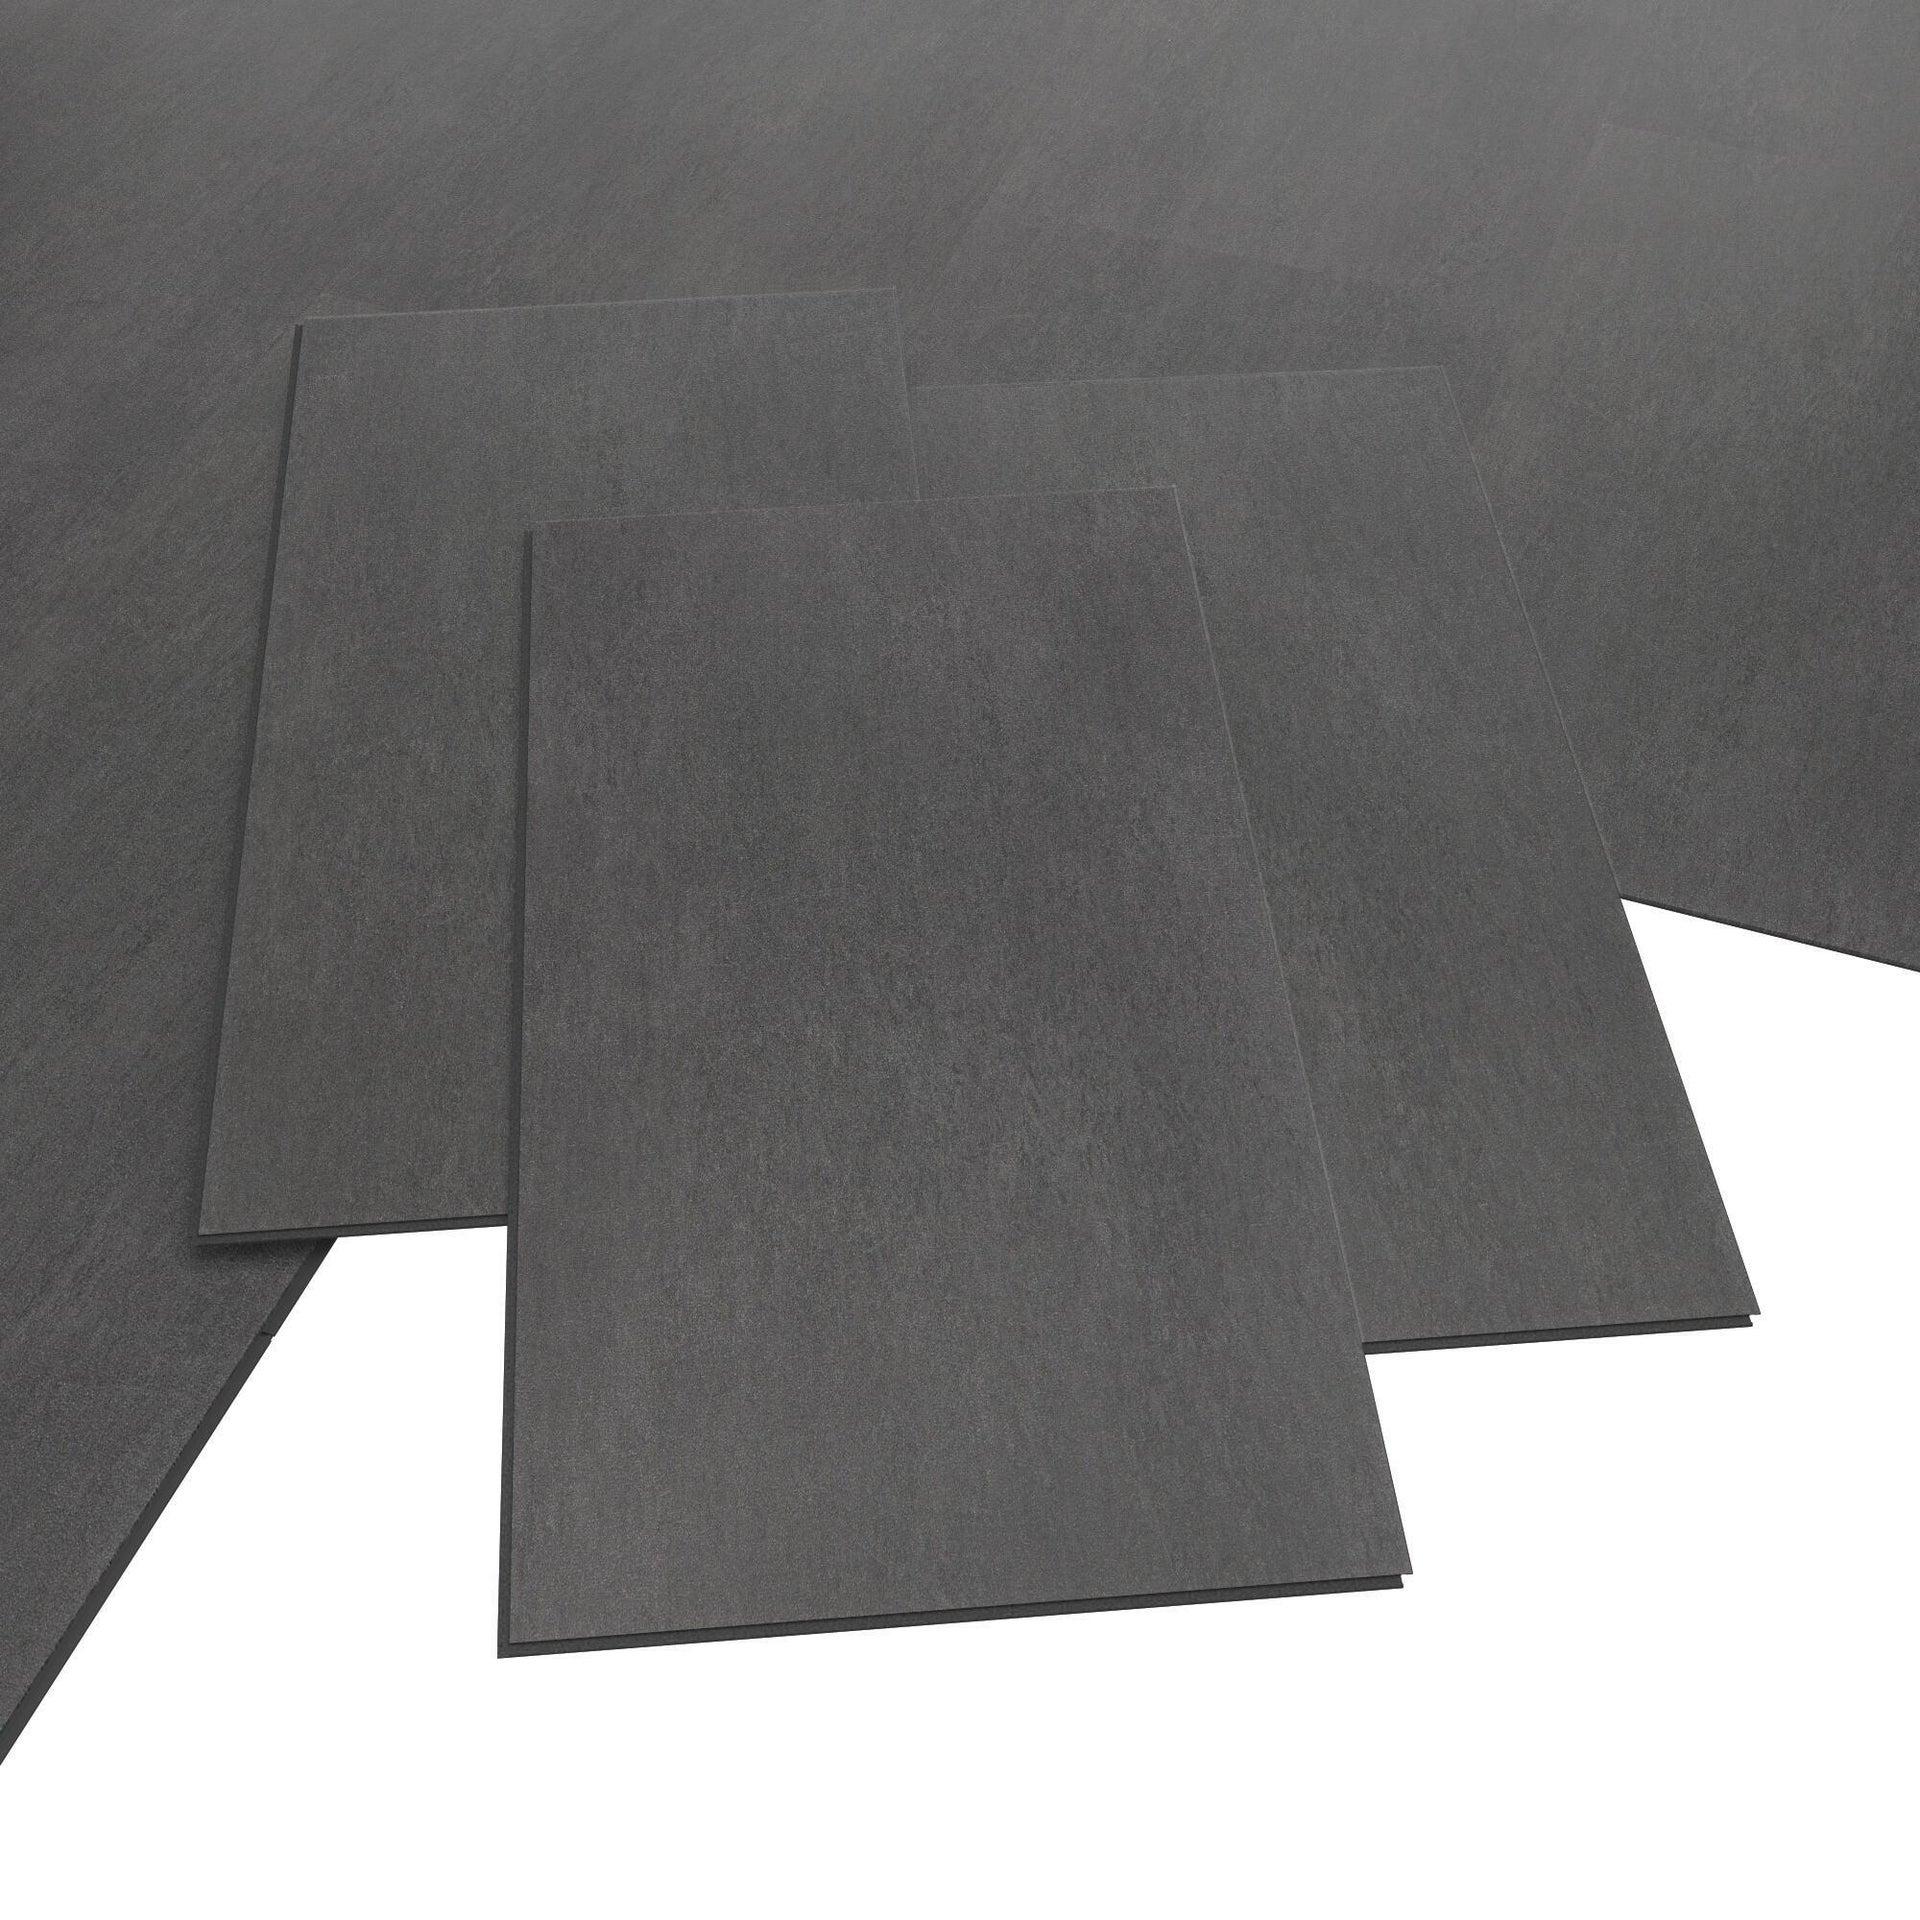 Pavimento PVC flottante clic+ Art For New Sp 4.2 mm nero - 16